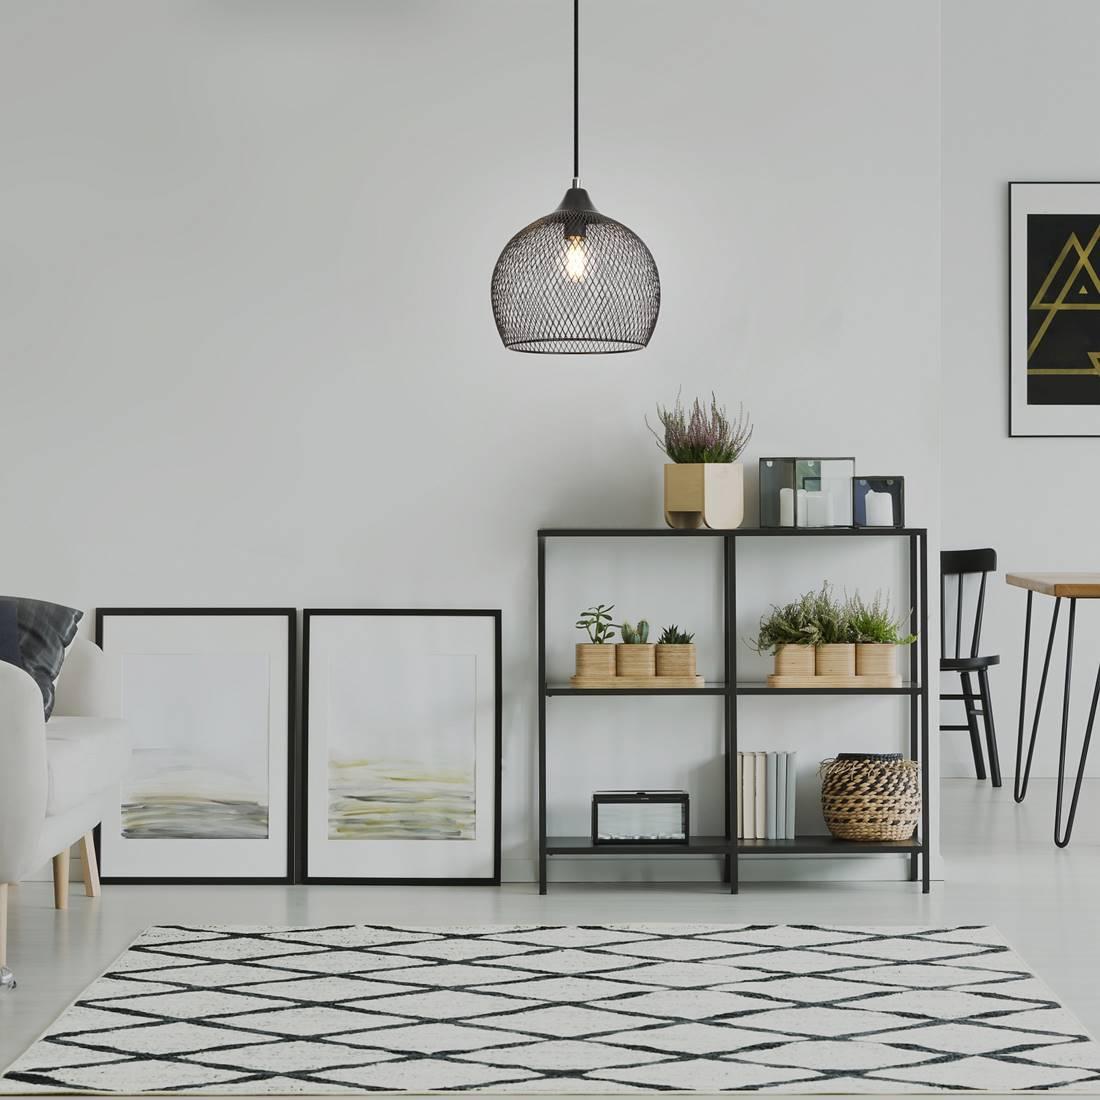 pendelleuchte ronan metall schwarz b 18cm h 127cm. Black Bedroom Furniture Sets. Home Design Ideas